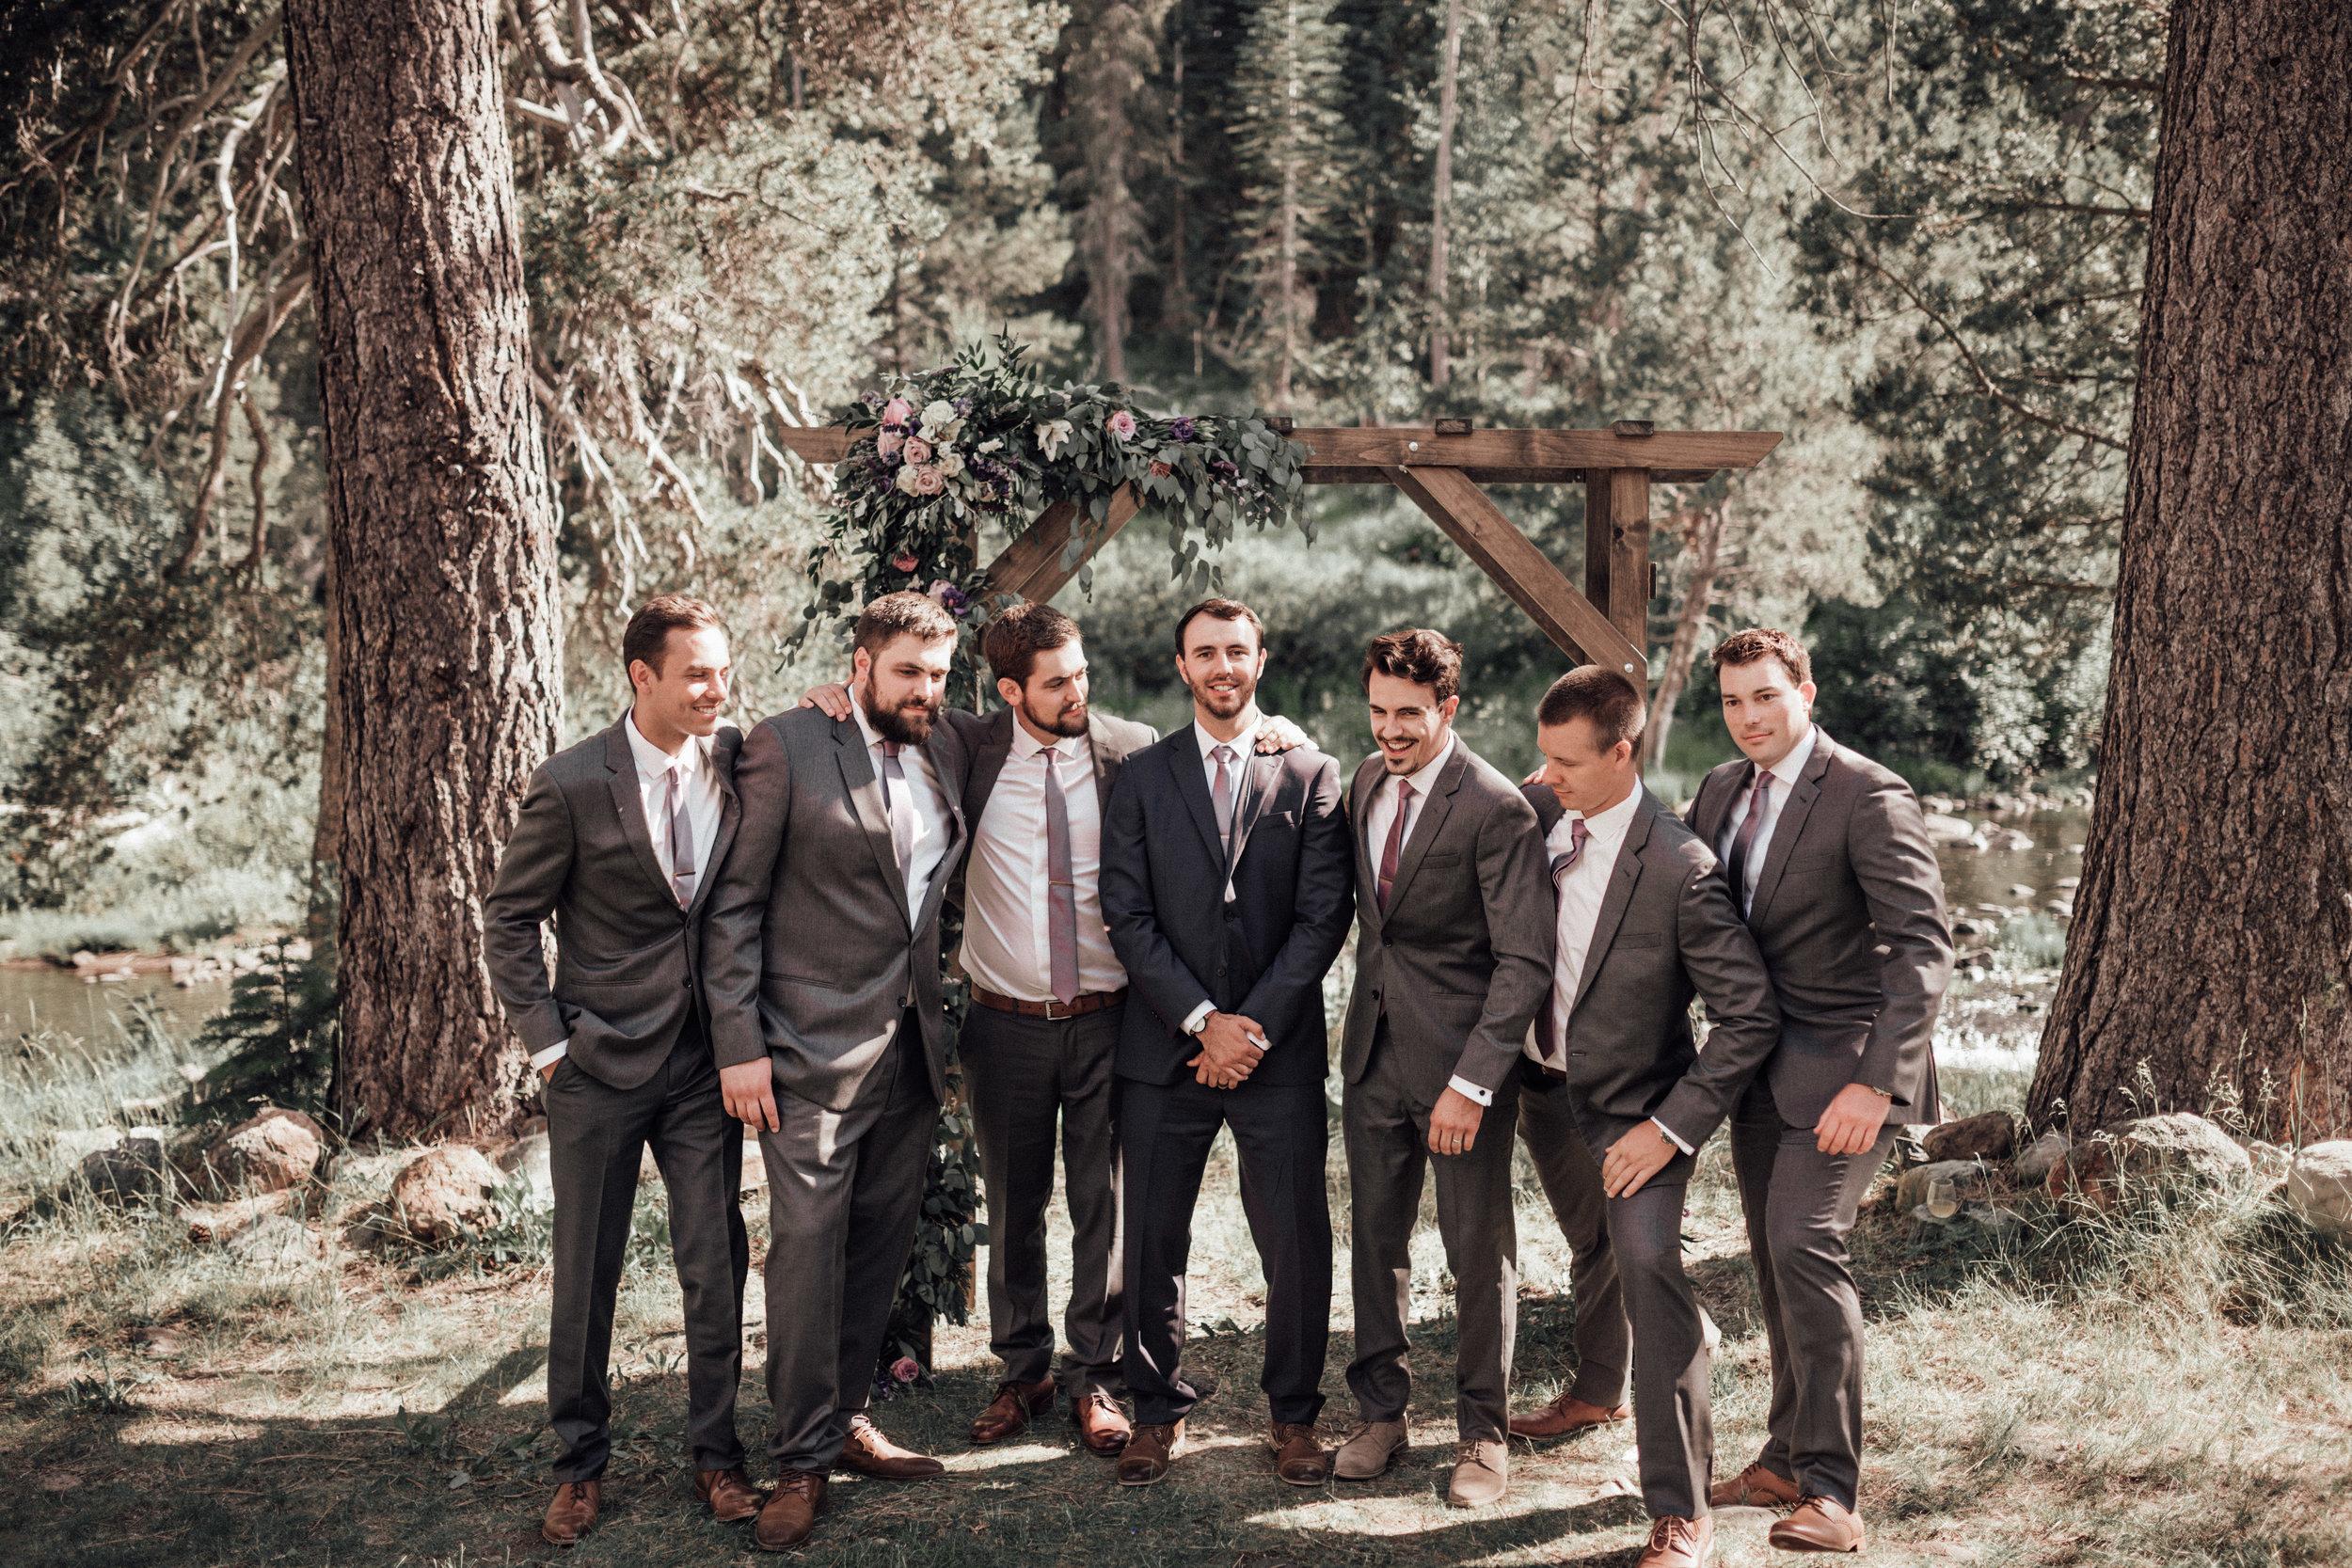 may-wedding-dancing-pines-sierraville-wedding-ca-danielle-kyle-junebug-photography-lake-tahoe-1-1467.jpg